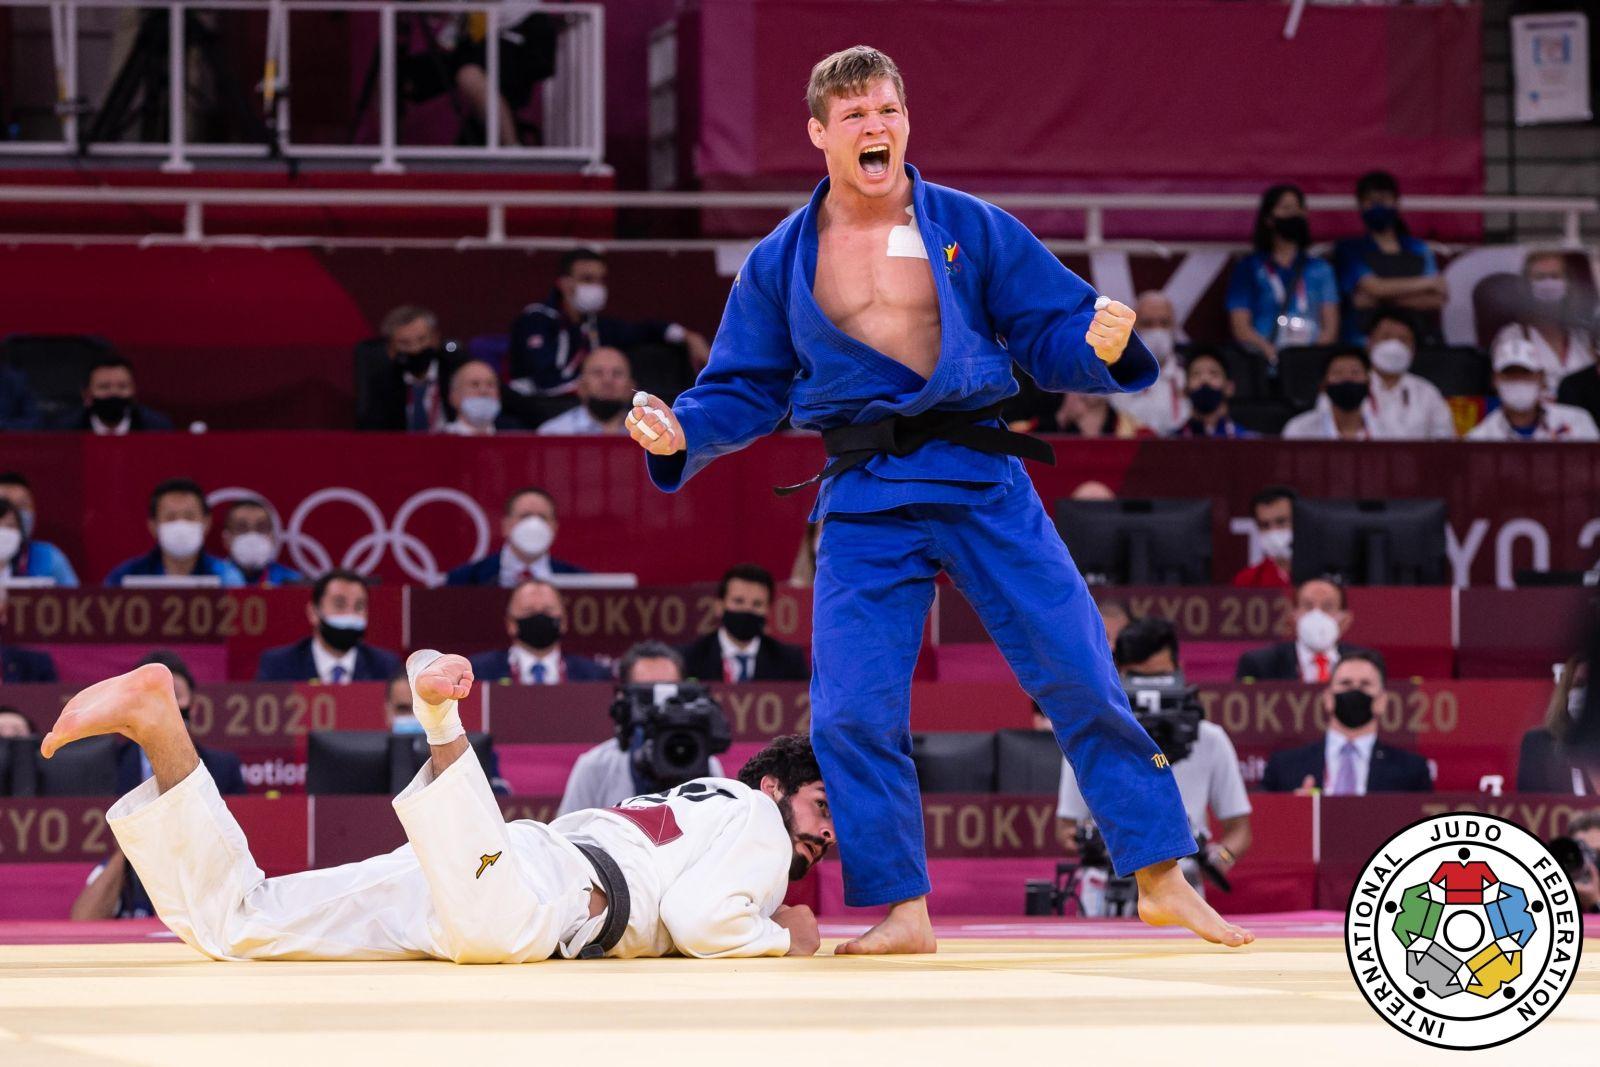 2021-olympijske-hry-tokio-judo-casse